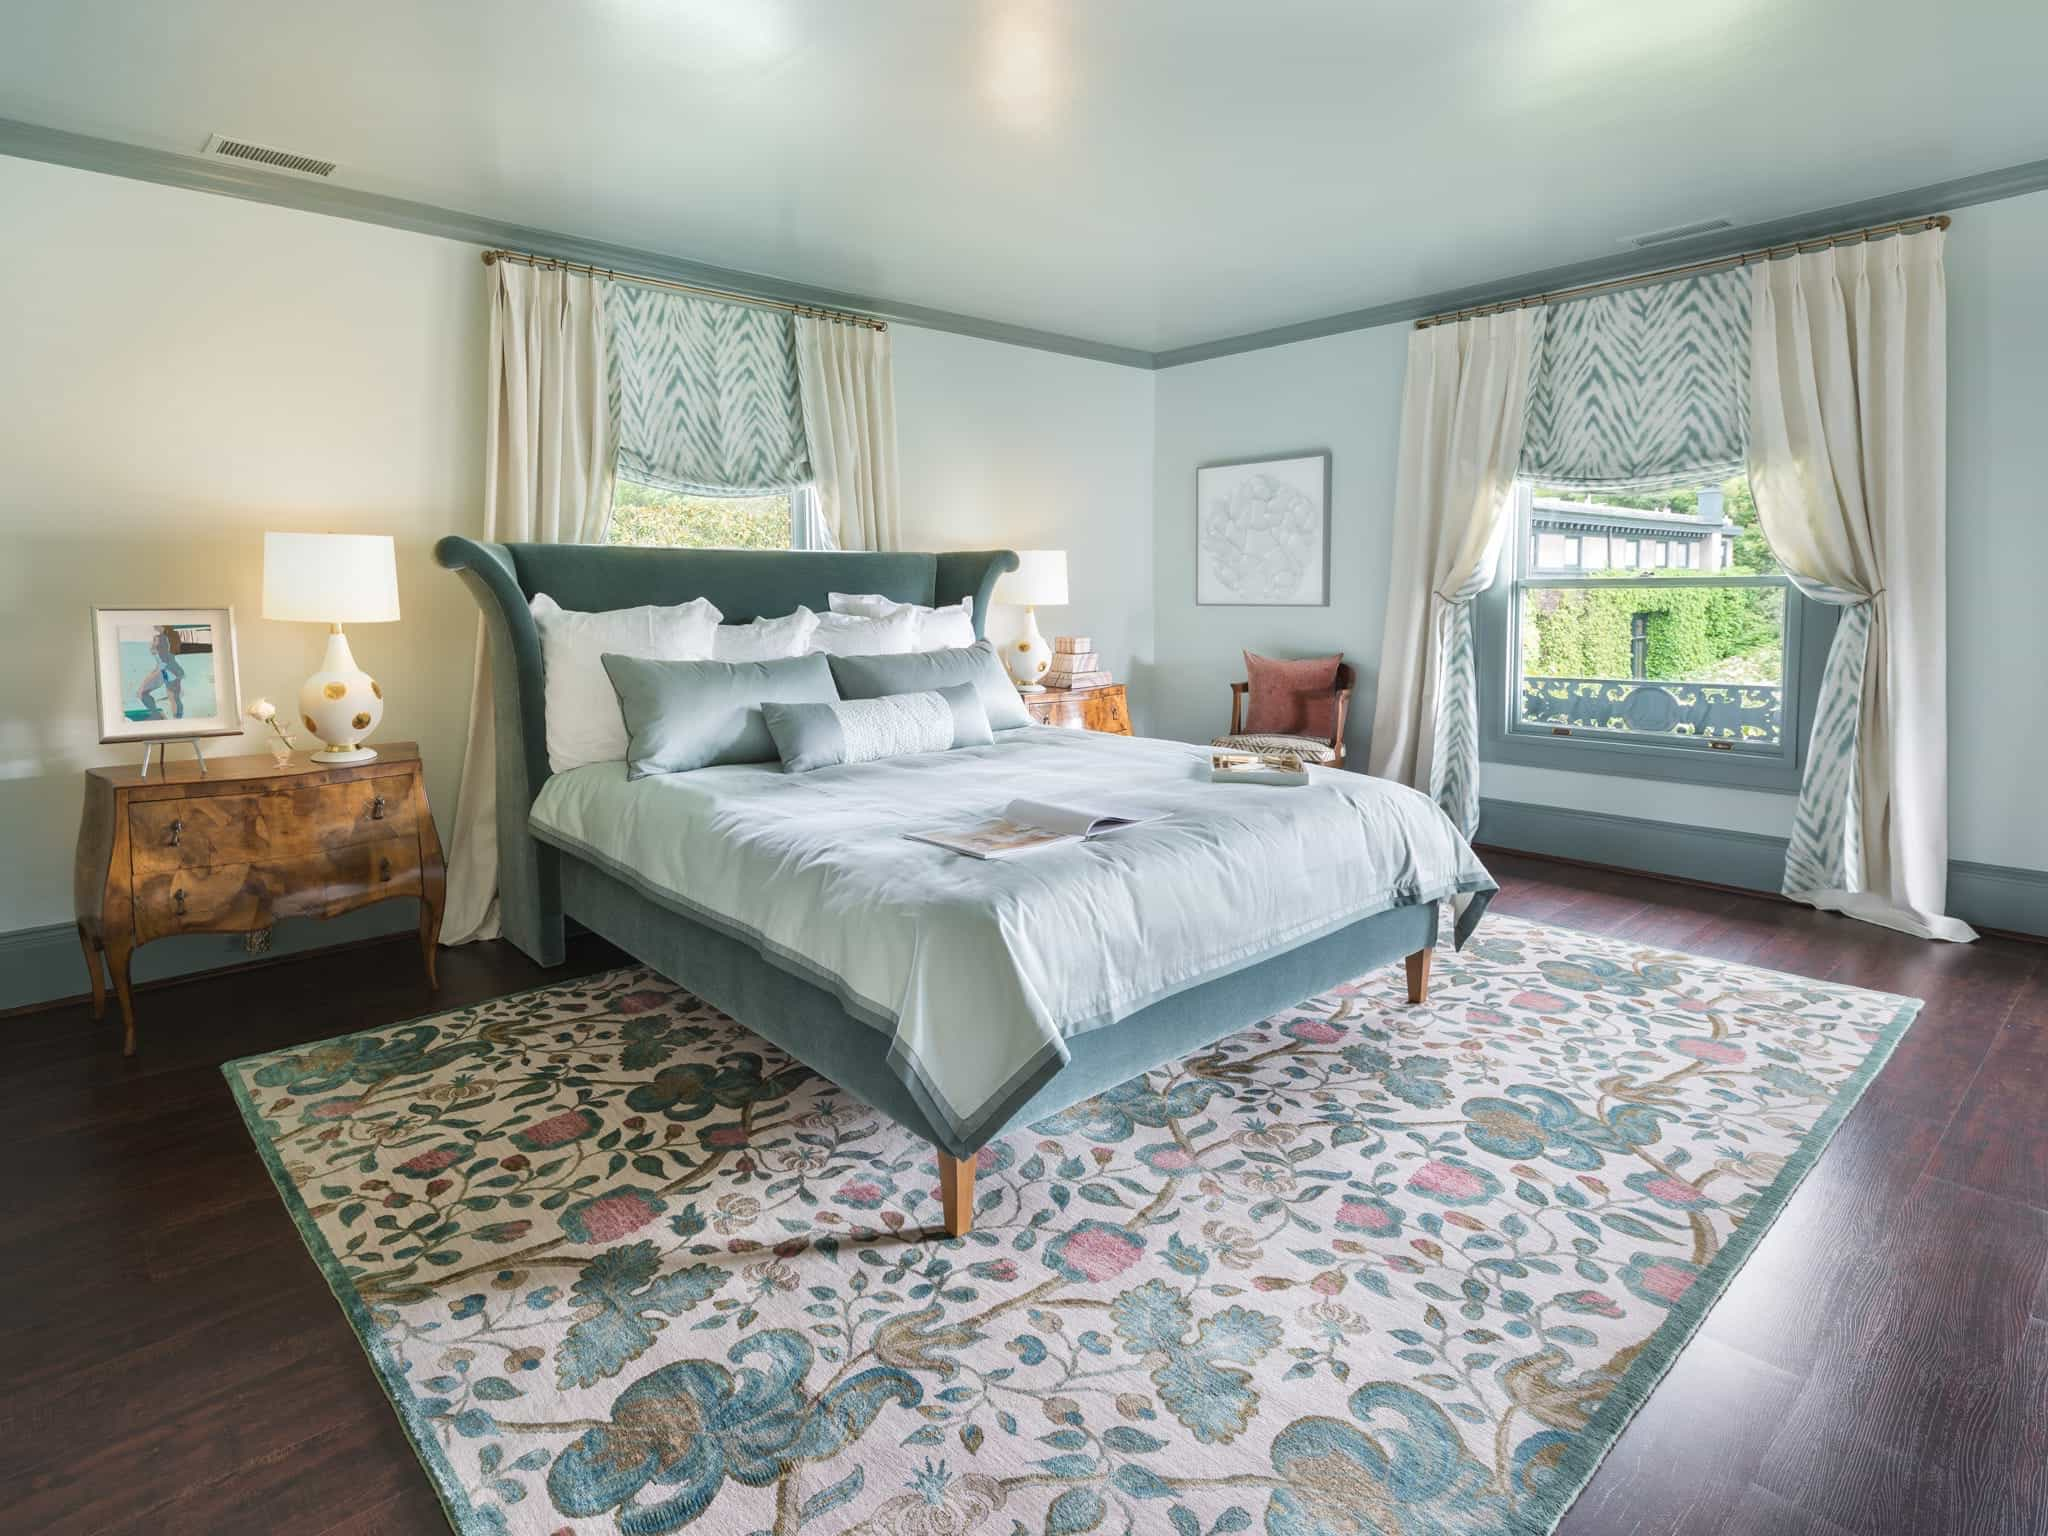 10 Vintage Bedroom Decor Ideas